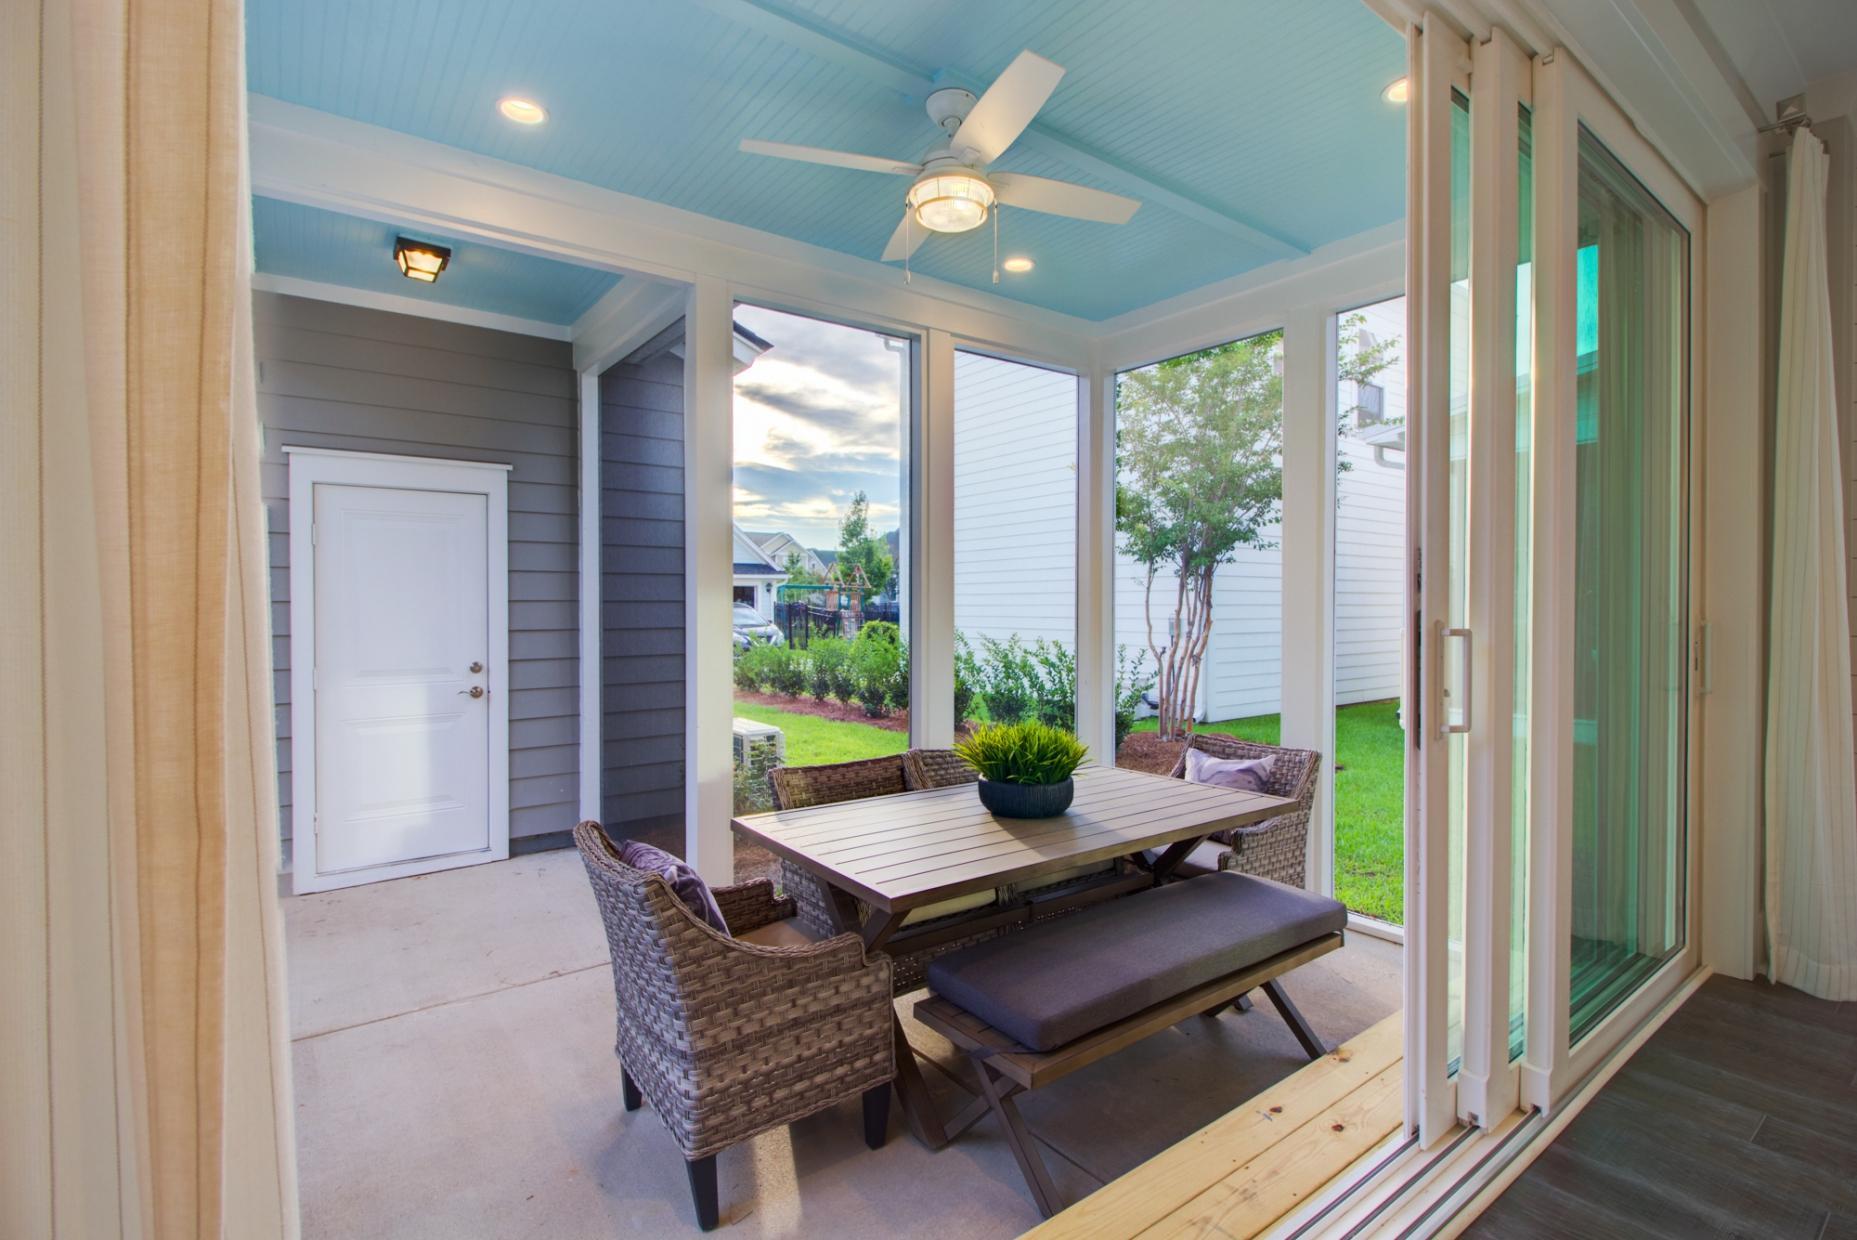 Carnes Crossroads Homes For Sale - 501 Wodin, Summerville, SC - 18